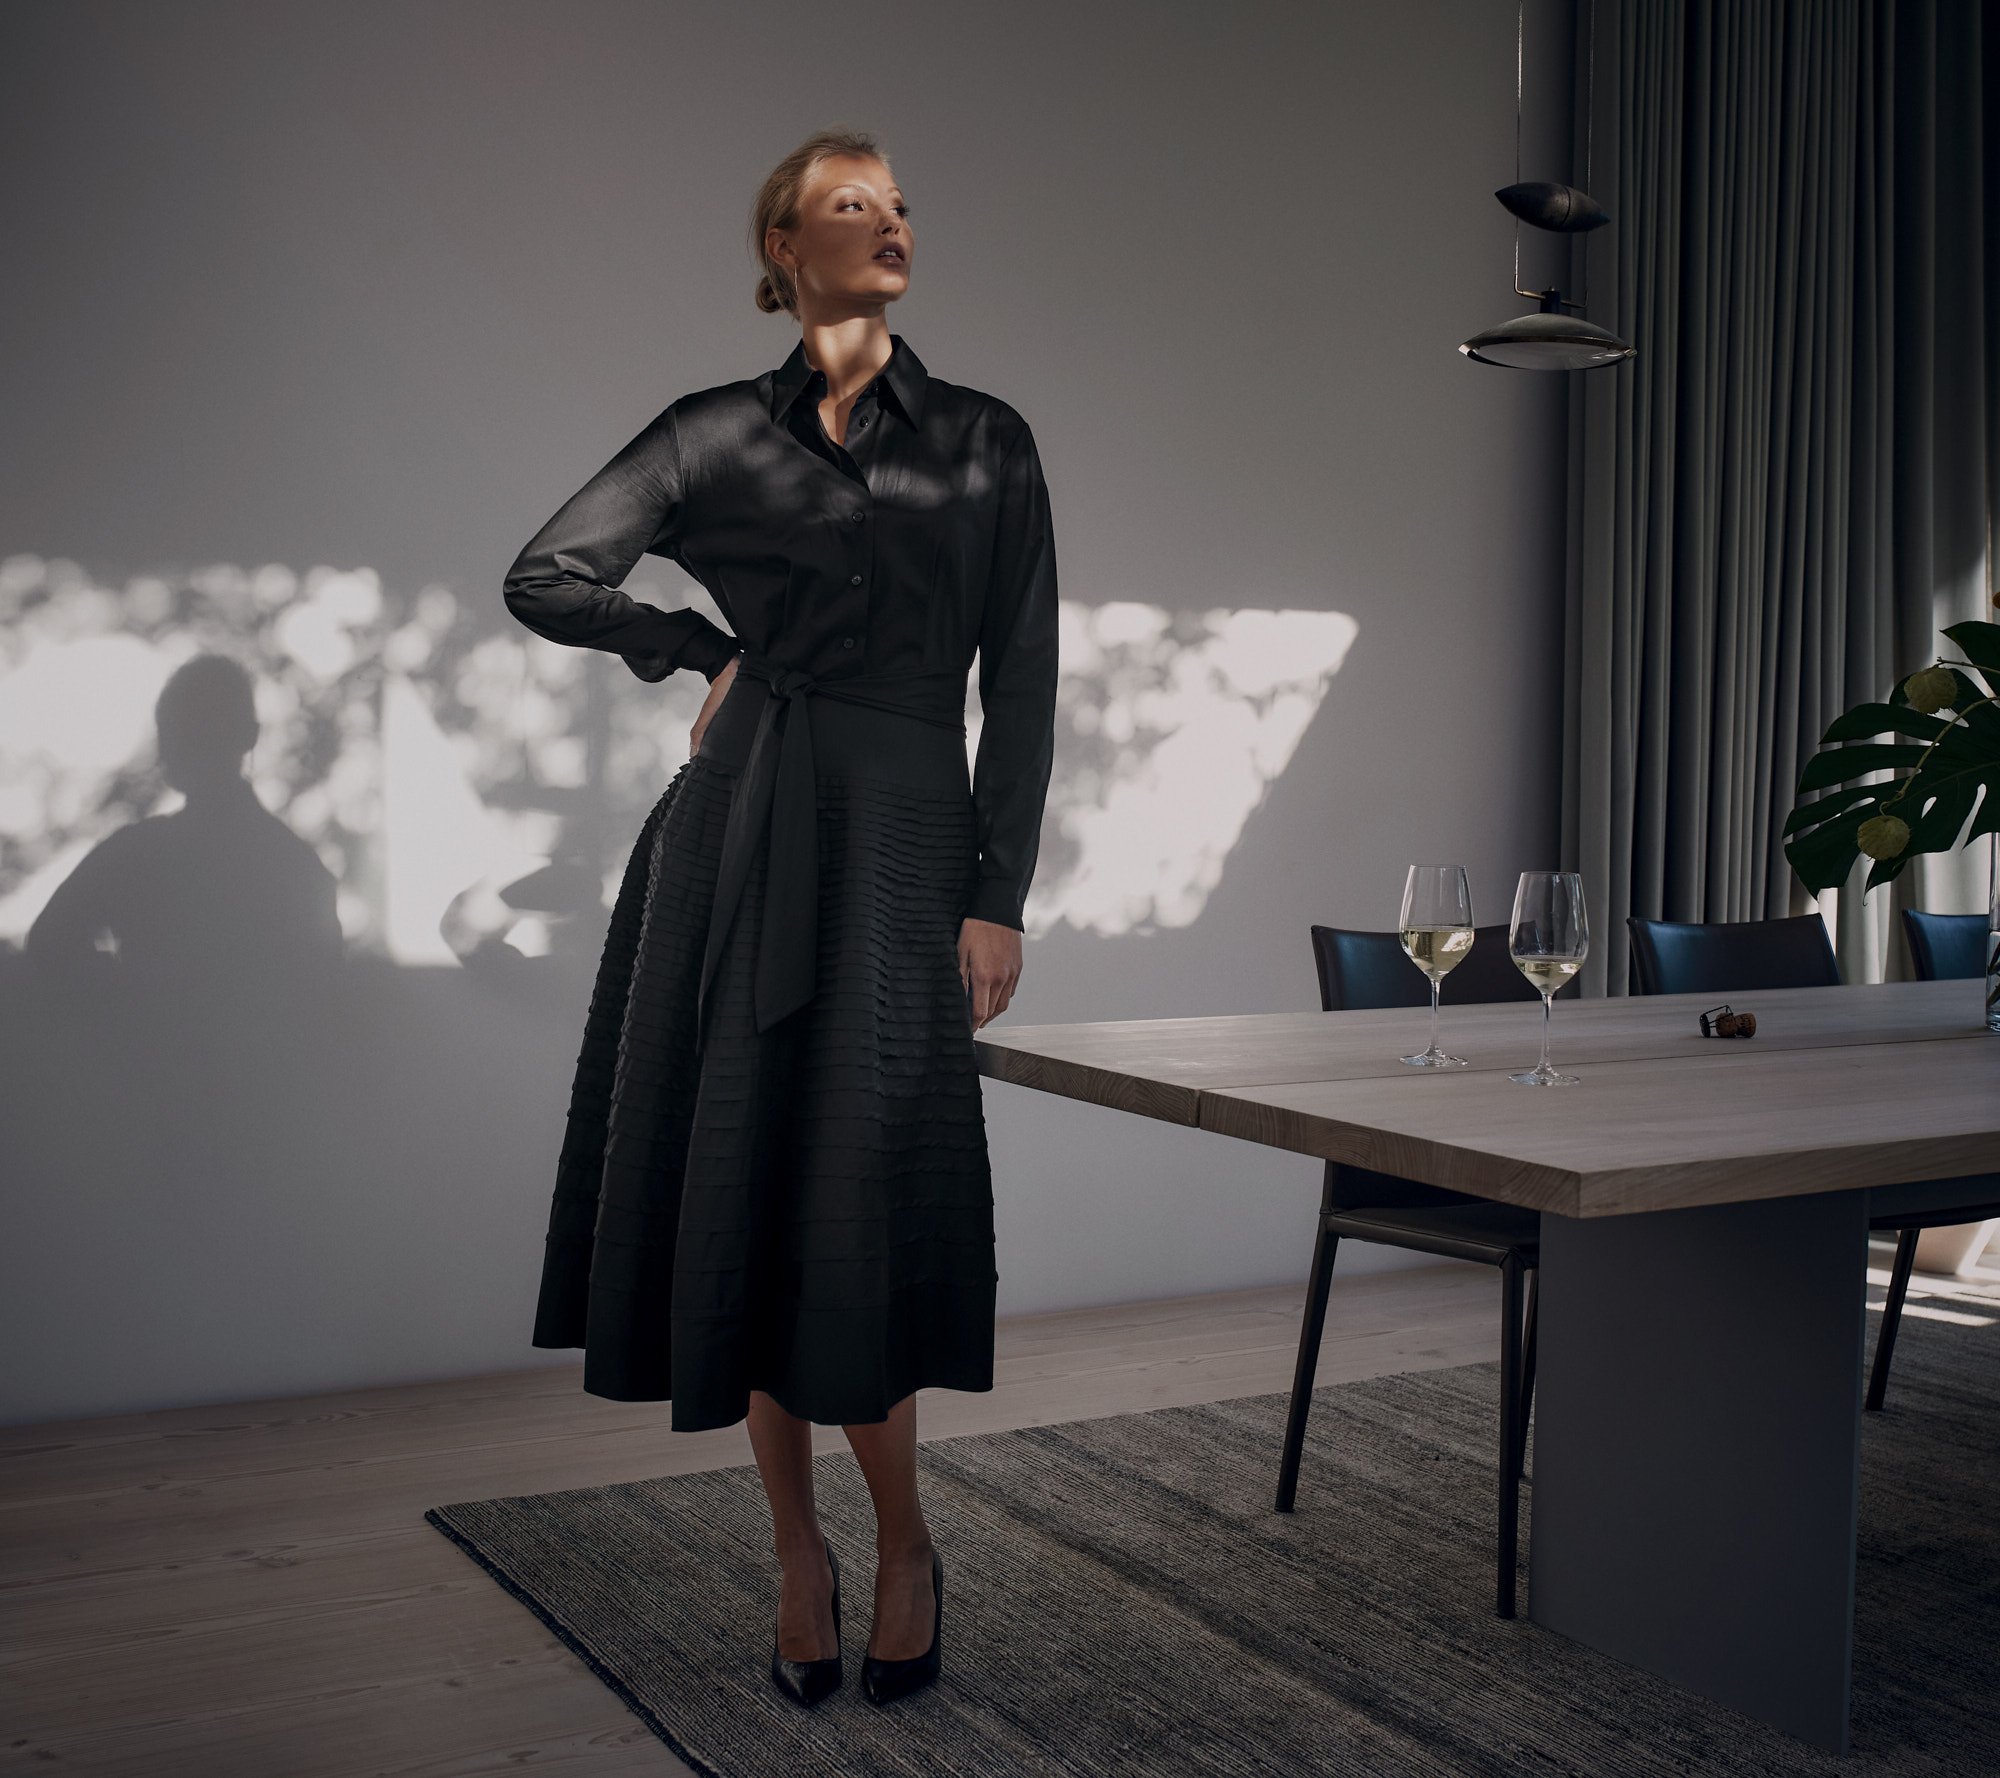 bernd-westphal-stillstars-vanlaack-women-auttum-winter-2020-fashion-still-life-photography-012